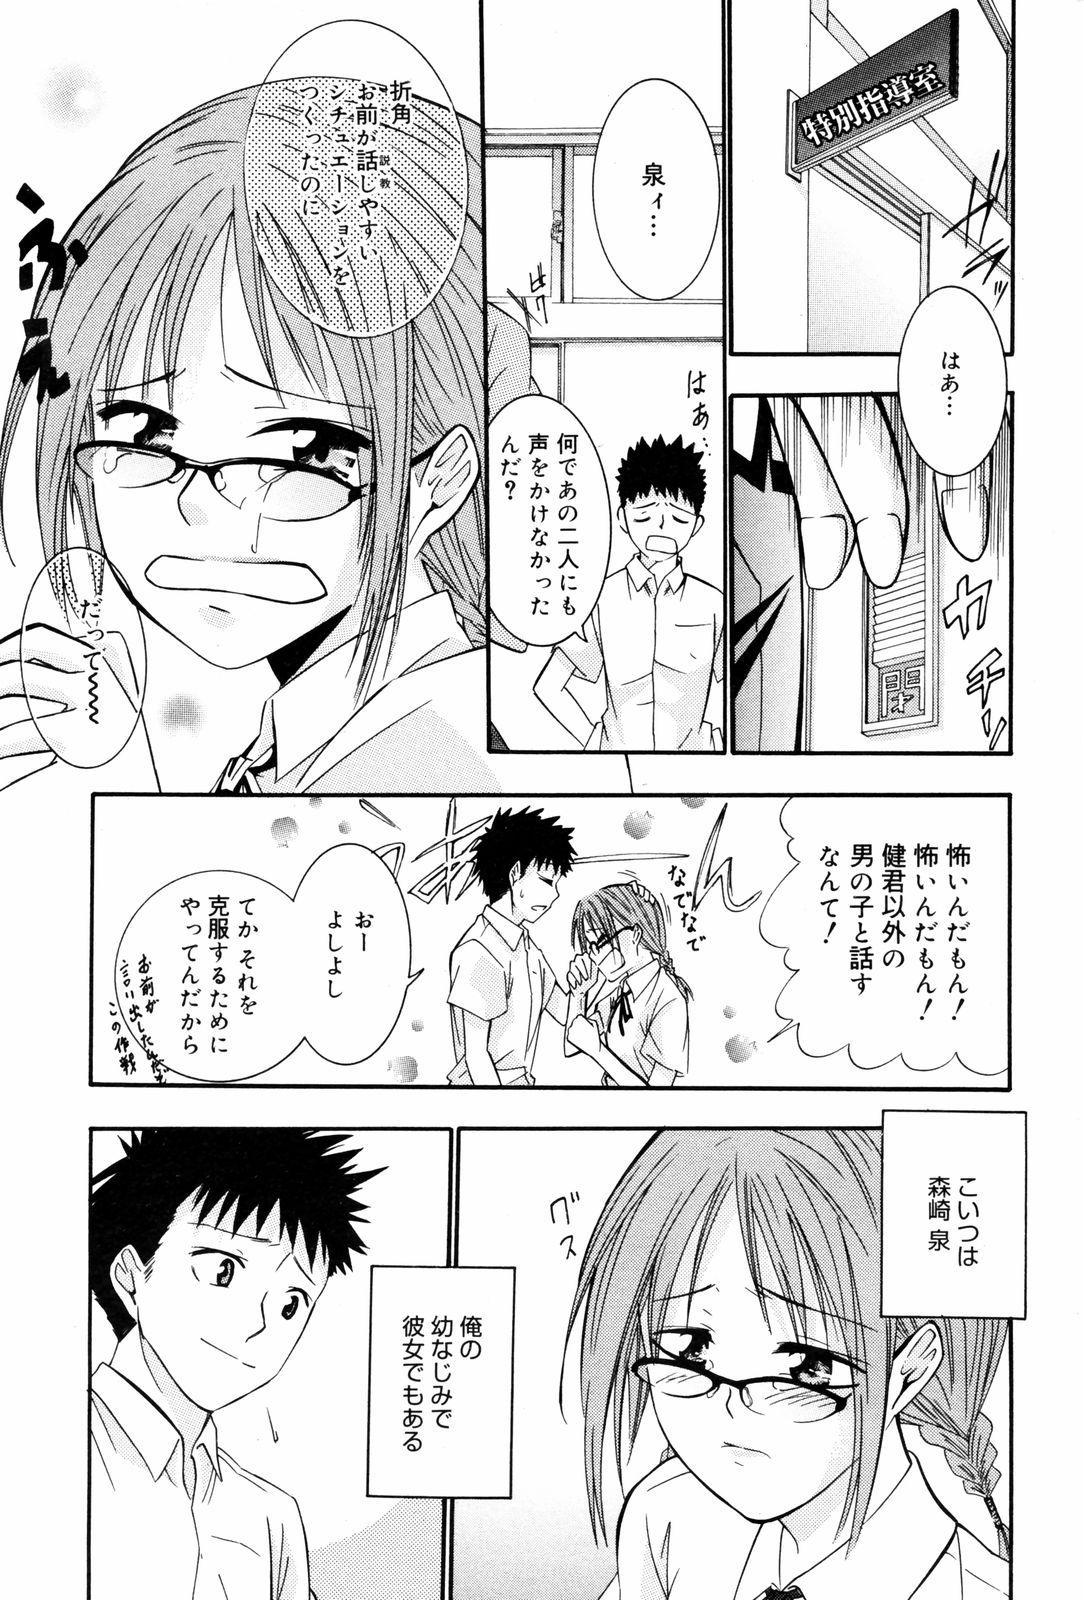 Manga Bangaichi 2008-03 230